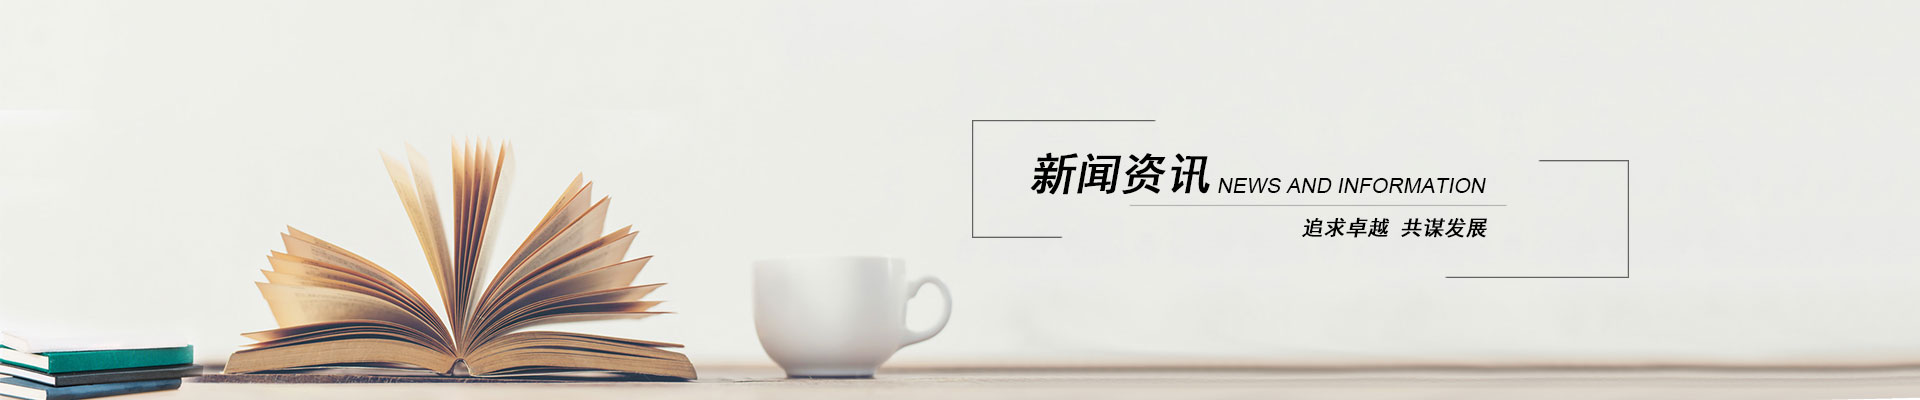 http://www.chinayanxin.com/data/images/slide/20200928144747_429.jpg